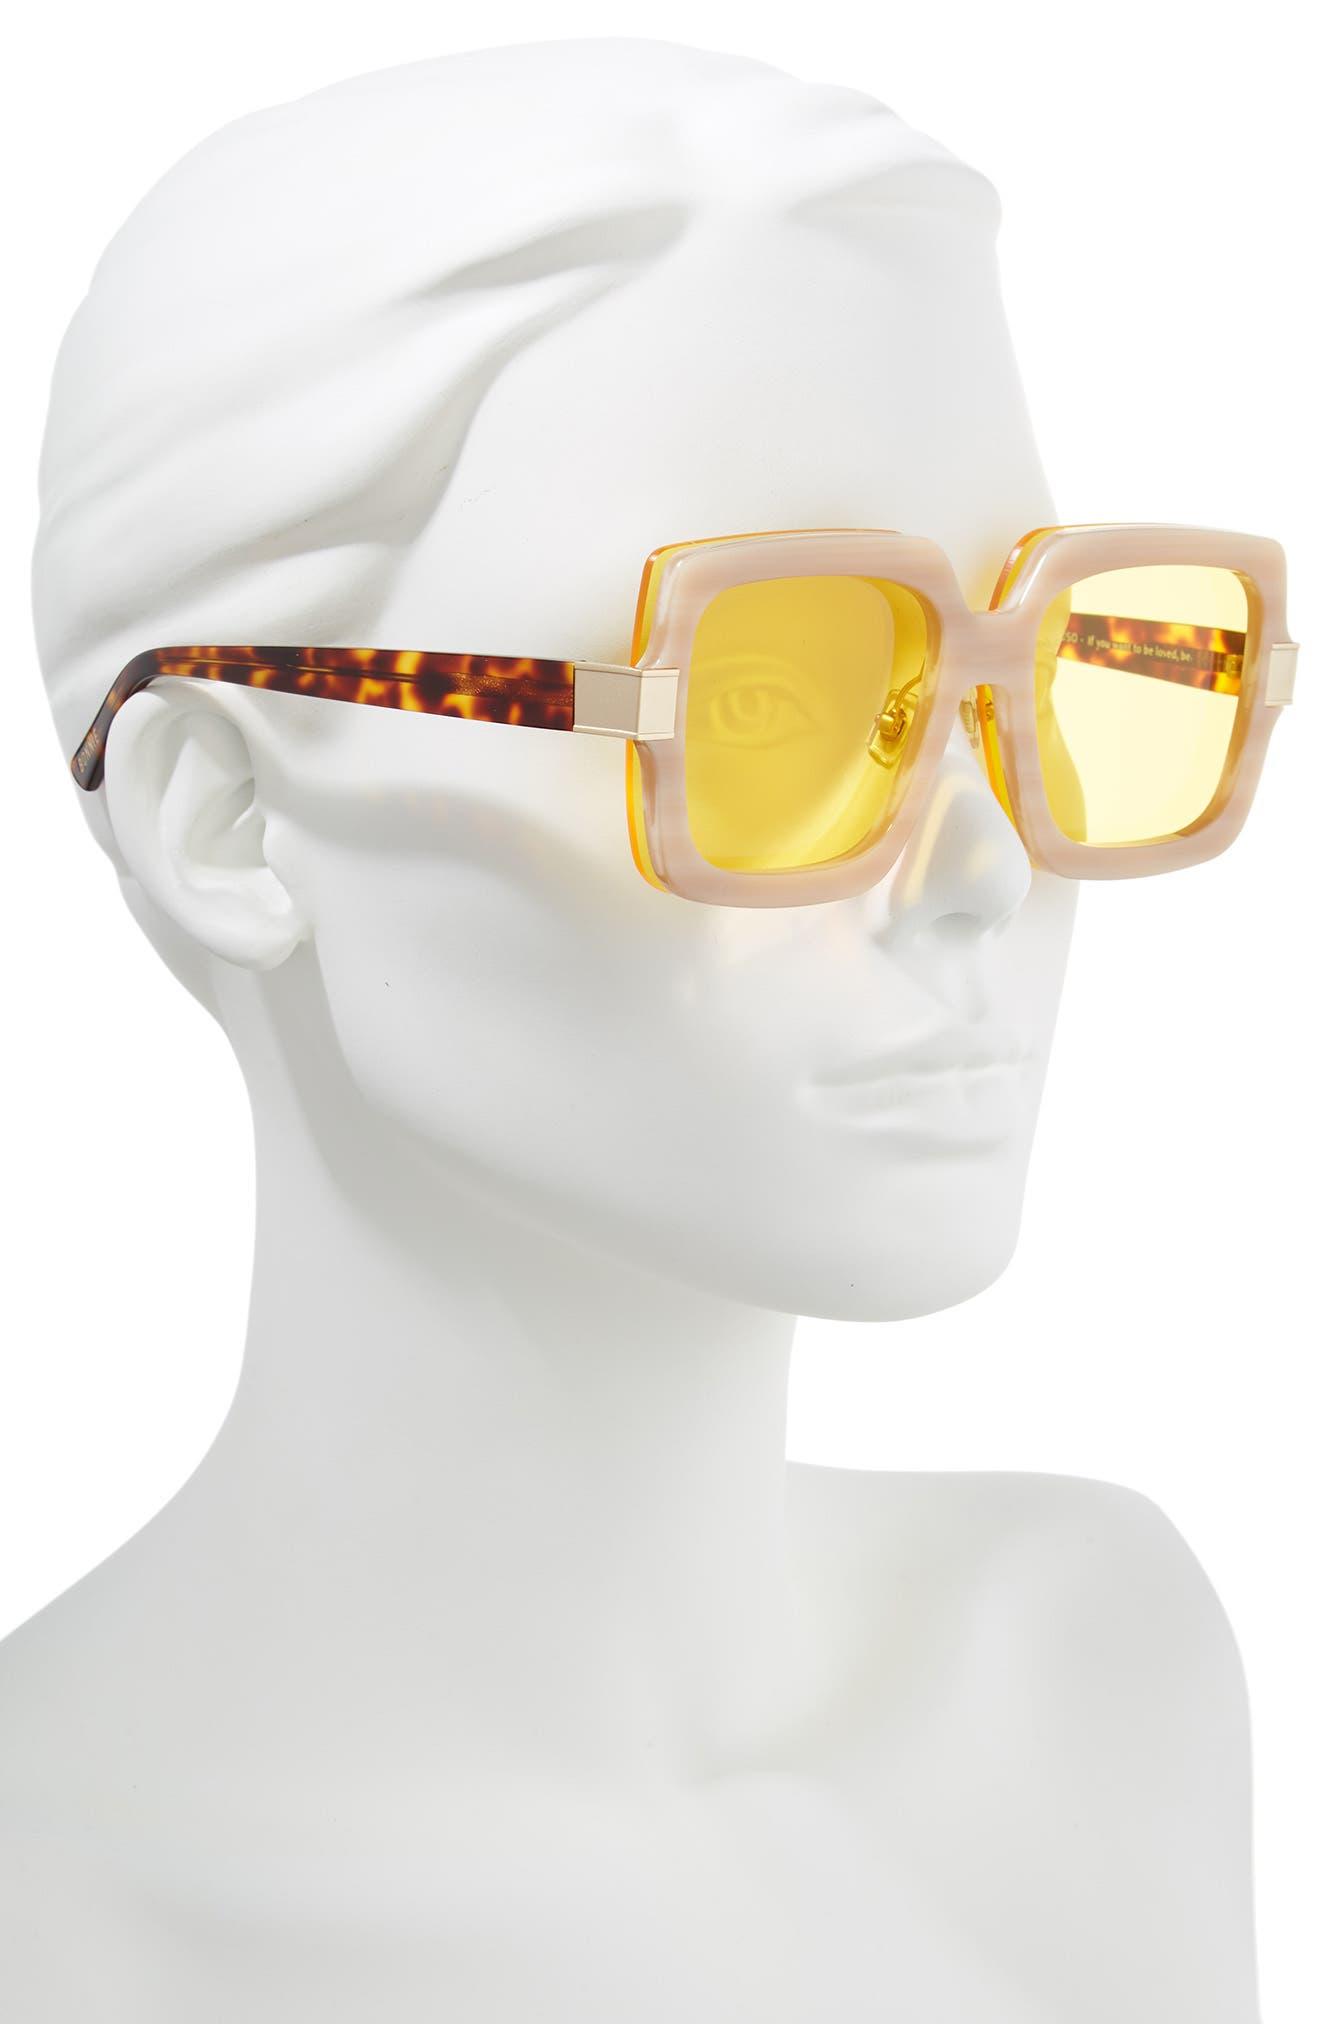 Mancuso 54mm Sunglasses,                             Alternate thumbnail 2, color,                             Red Elm/ Yellow